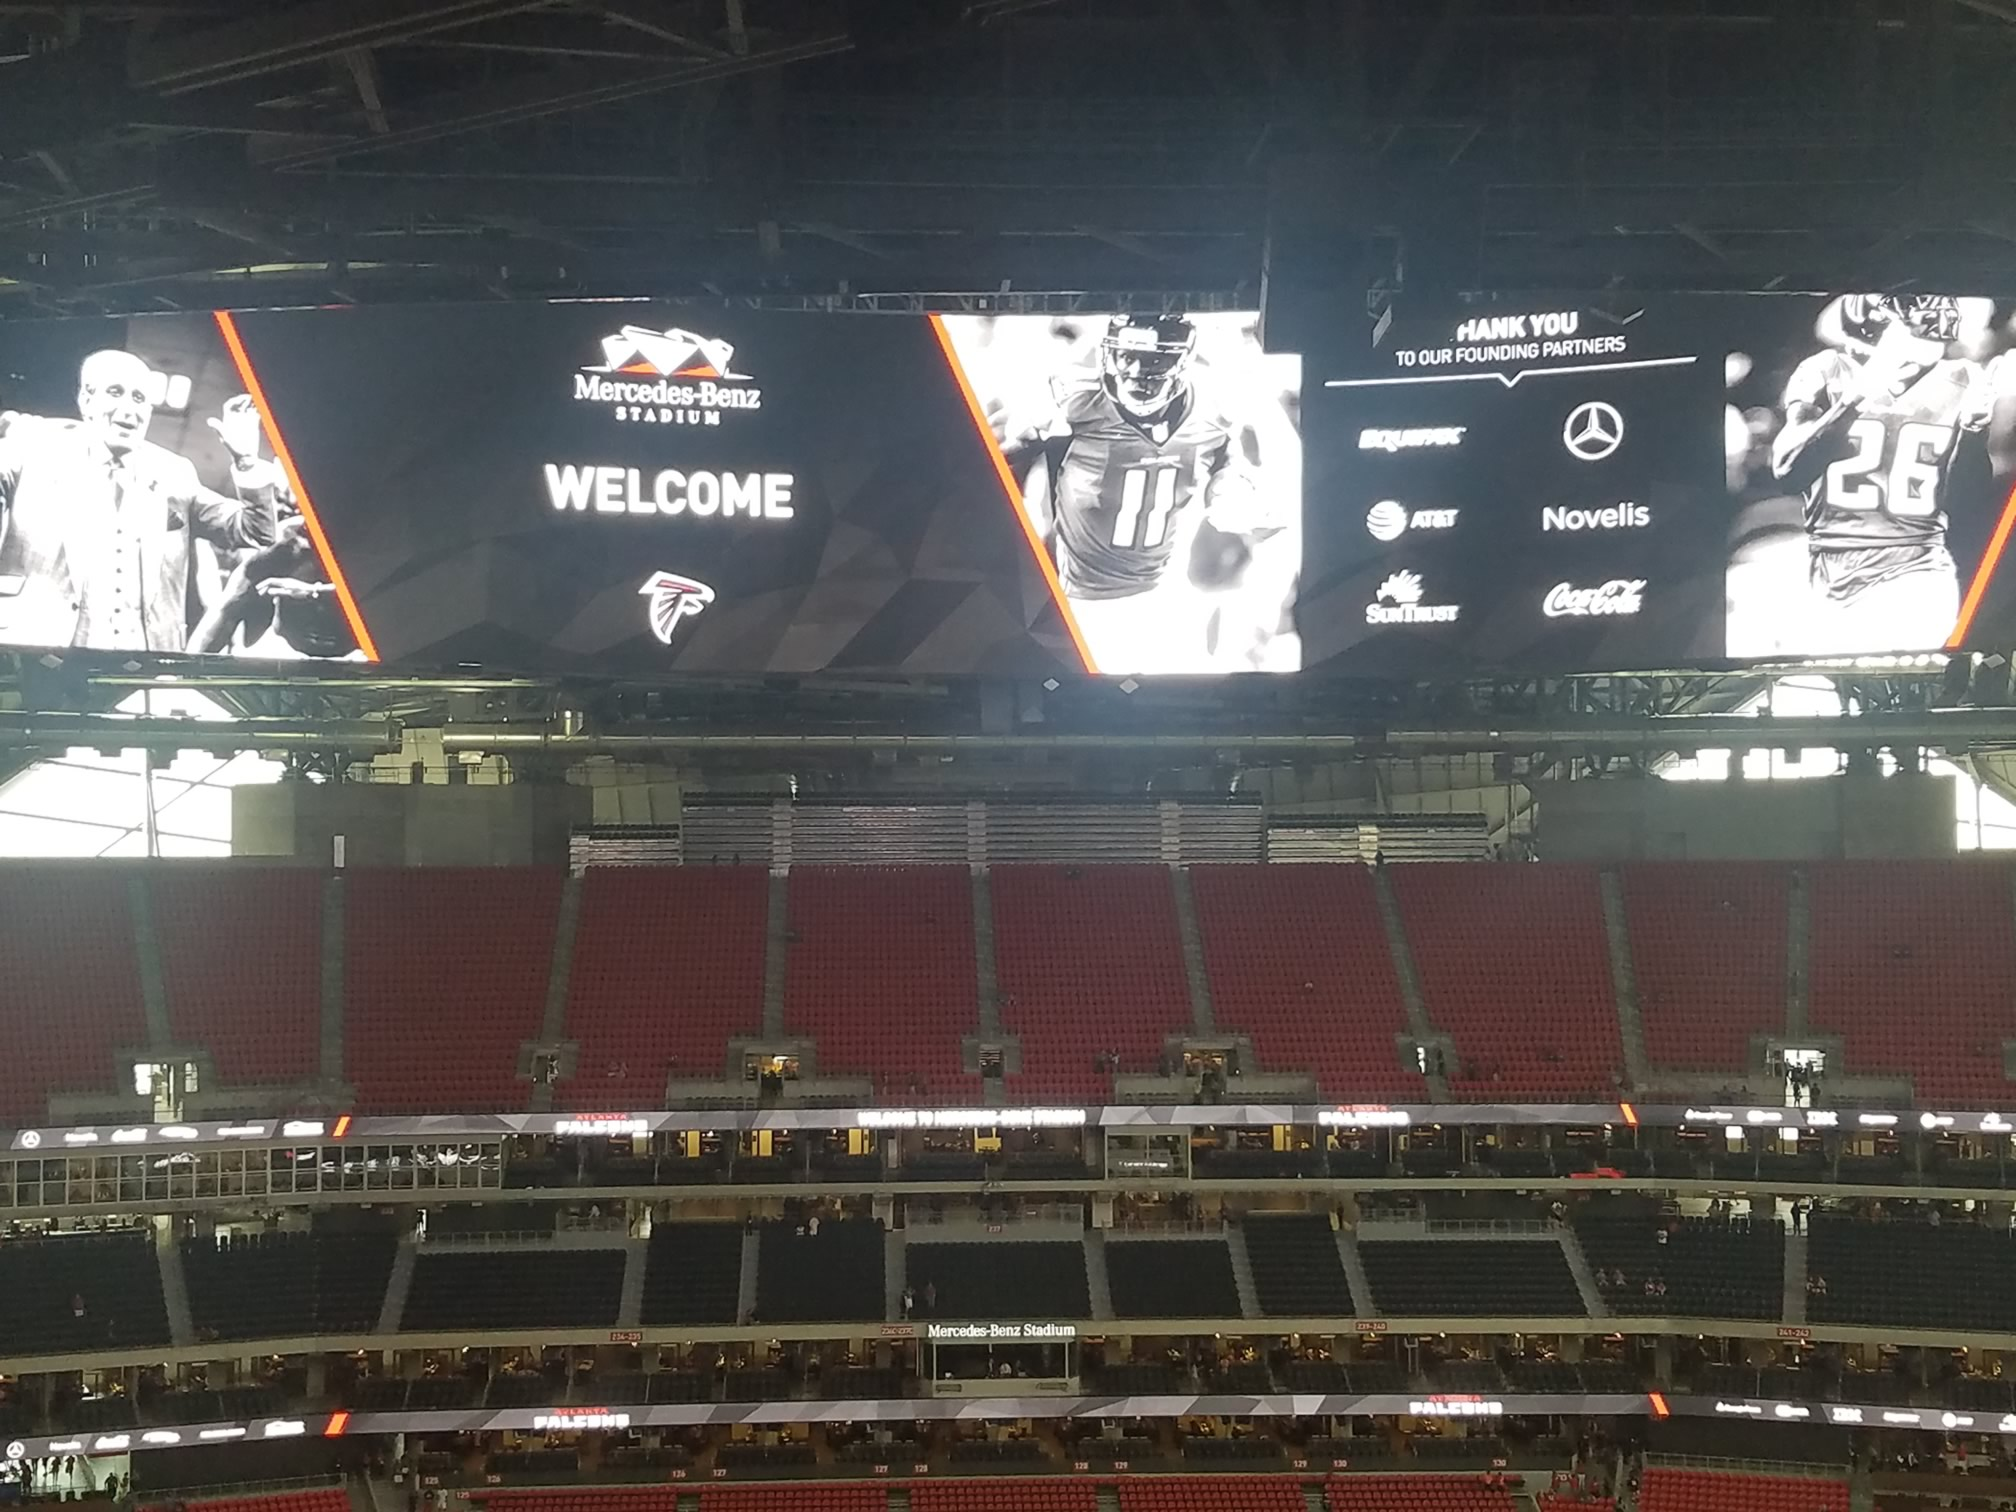 Mercedes benz stadium section 326 atlanta falcons for Mercedes benz stadium event schedule